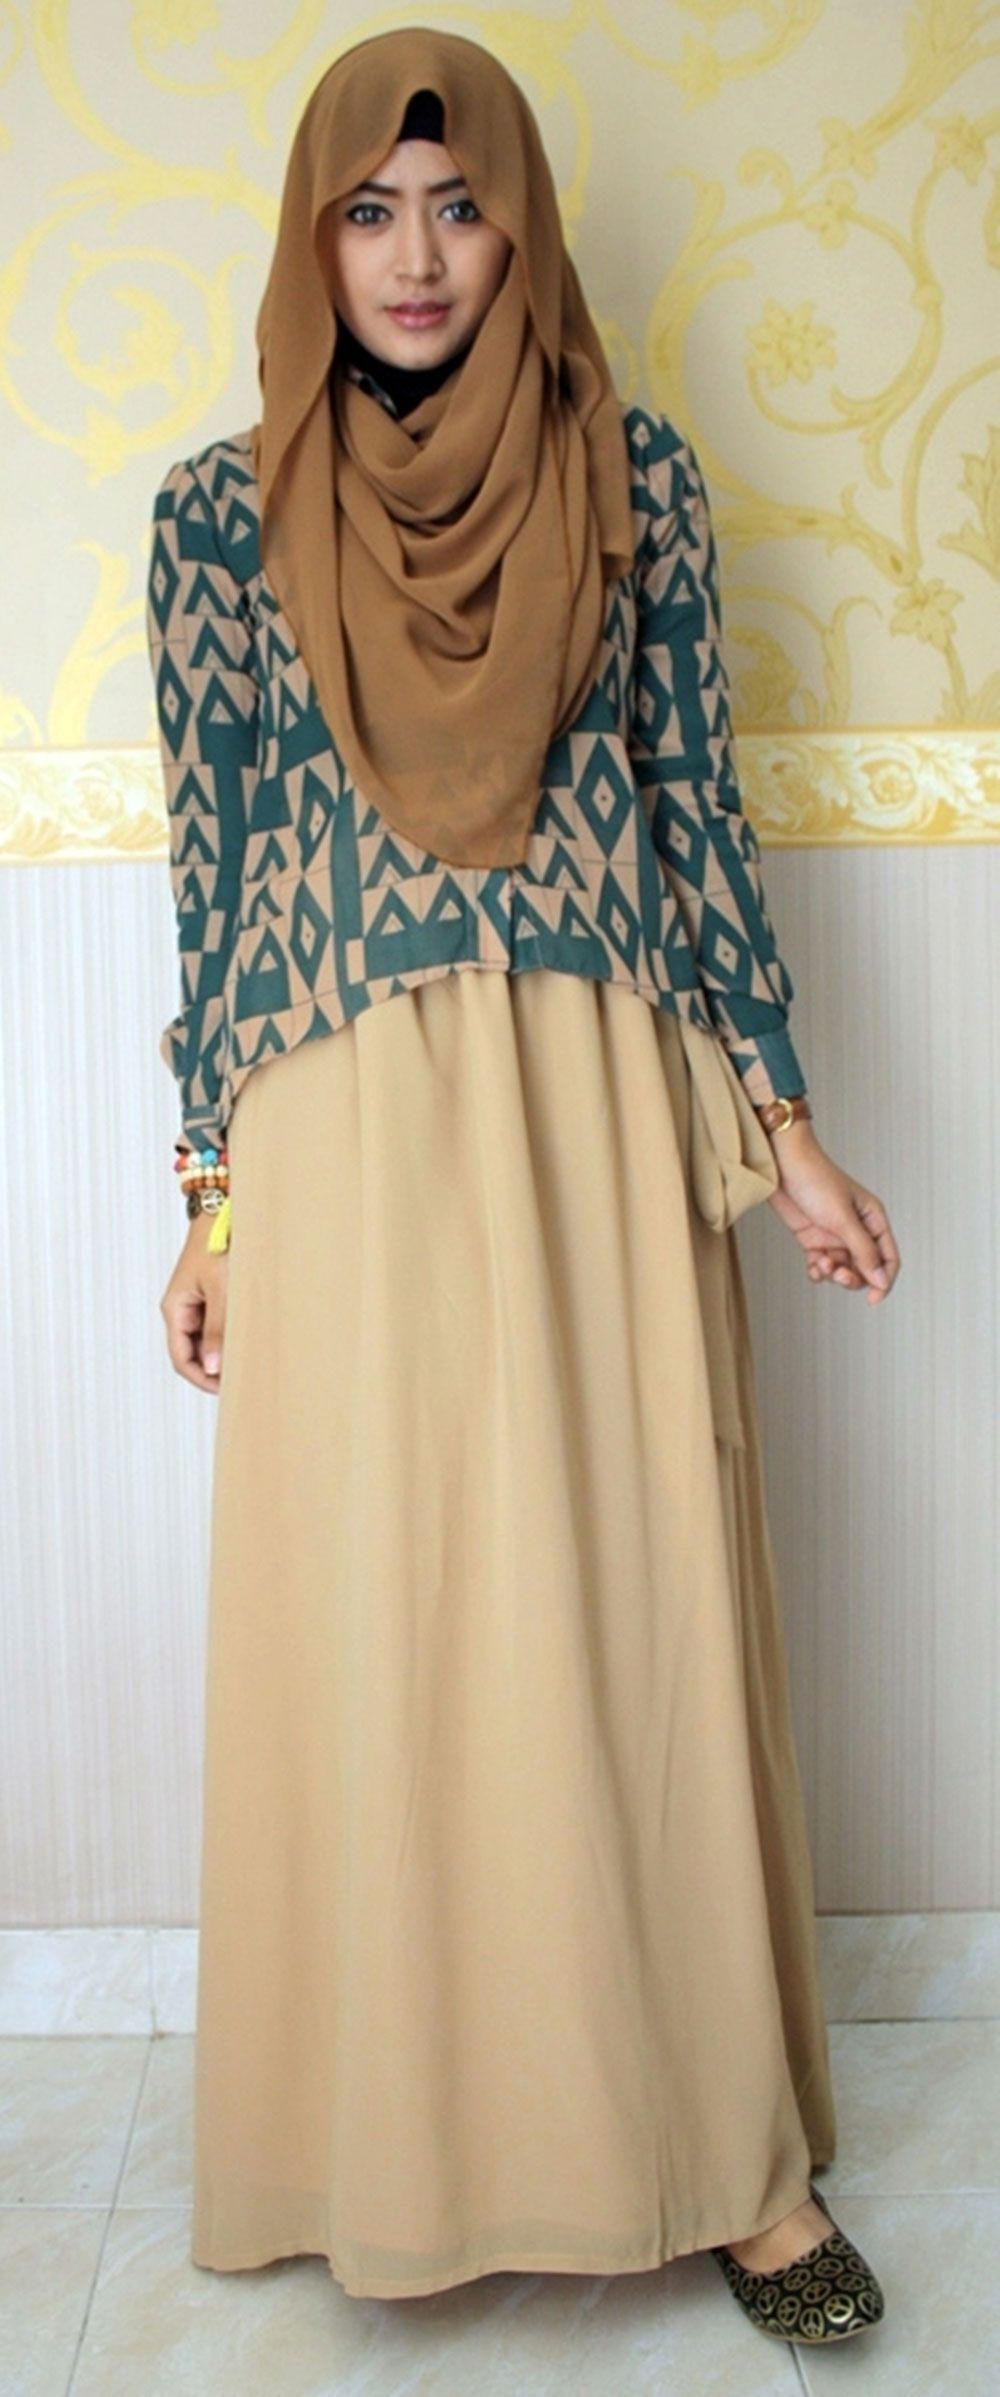 Baju gamis murah cantik things to wear pinterest hijabs hijab